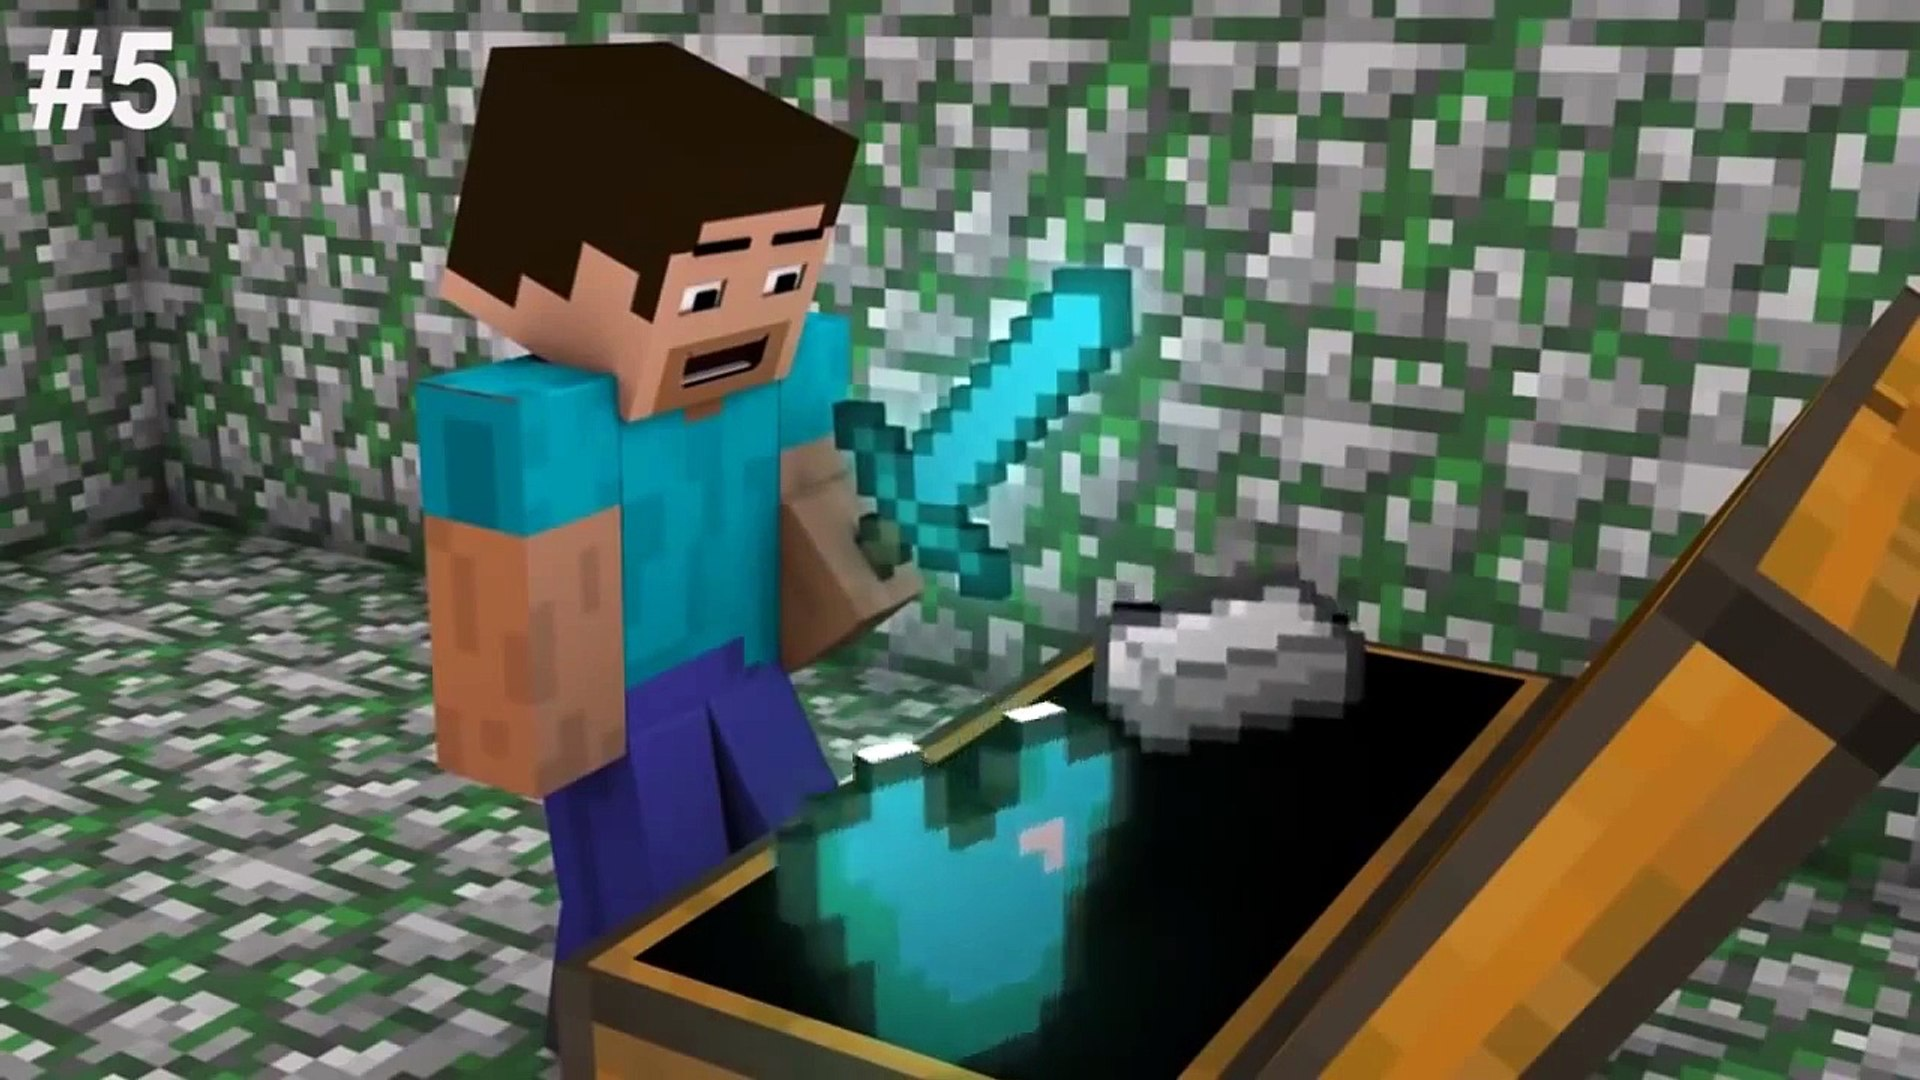 Top 5 Minecraft Song - March 2016 Best Minecraft Songs Animations Parody Parodies 2016